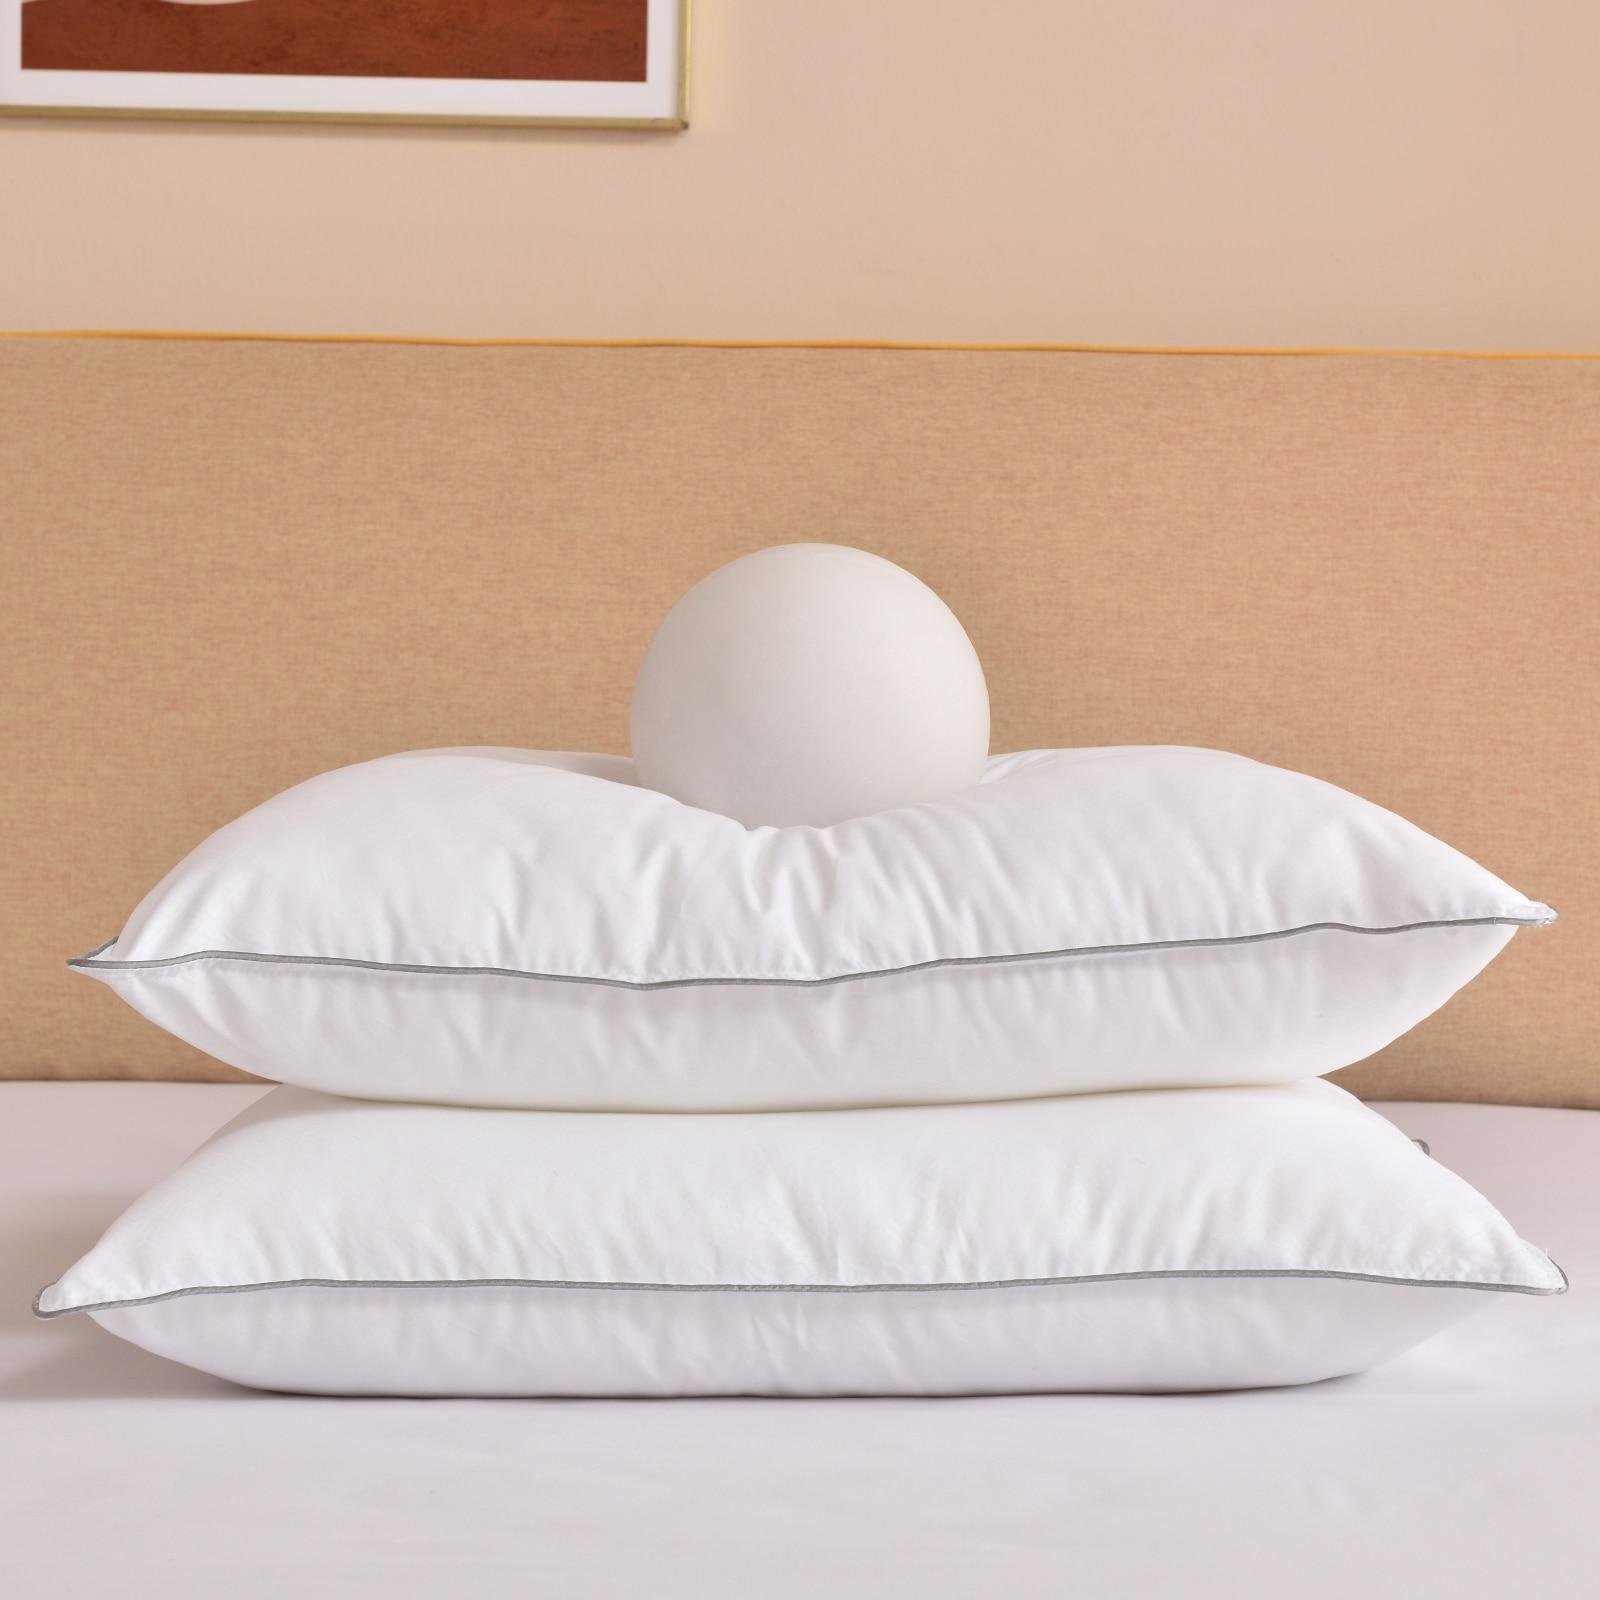 Buyoung السرير الوسائد للنوم 2 حزمة ، الأبيض الفراش وسادة لينة رقيق فندق الوسائد ل الجانب والظهر النائمون